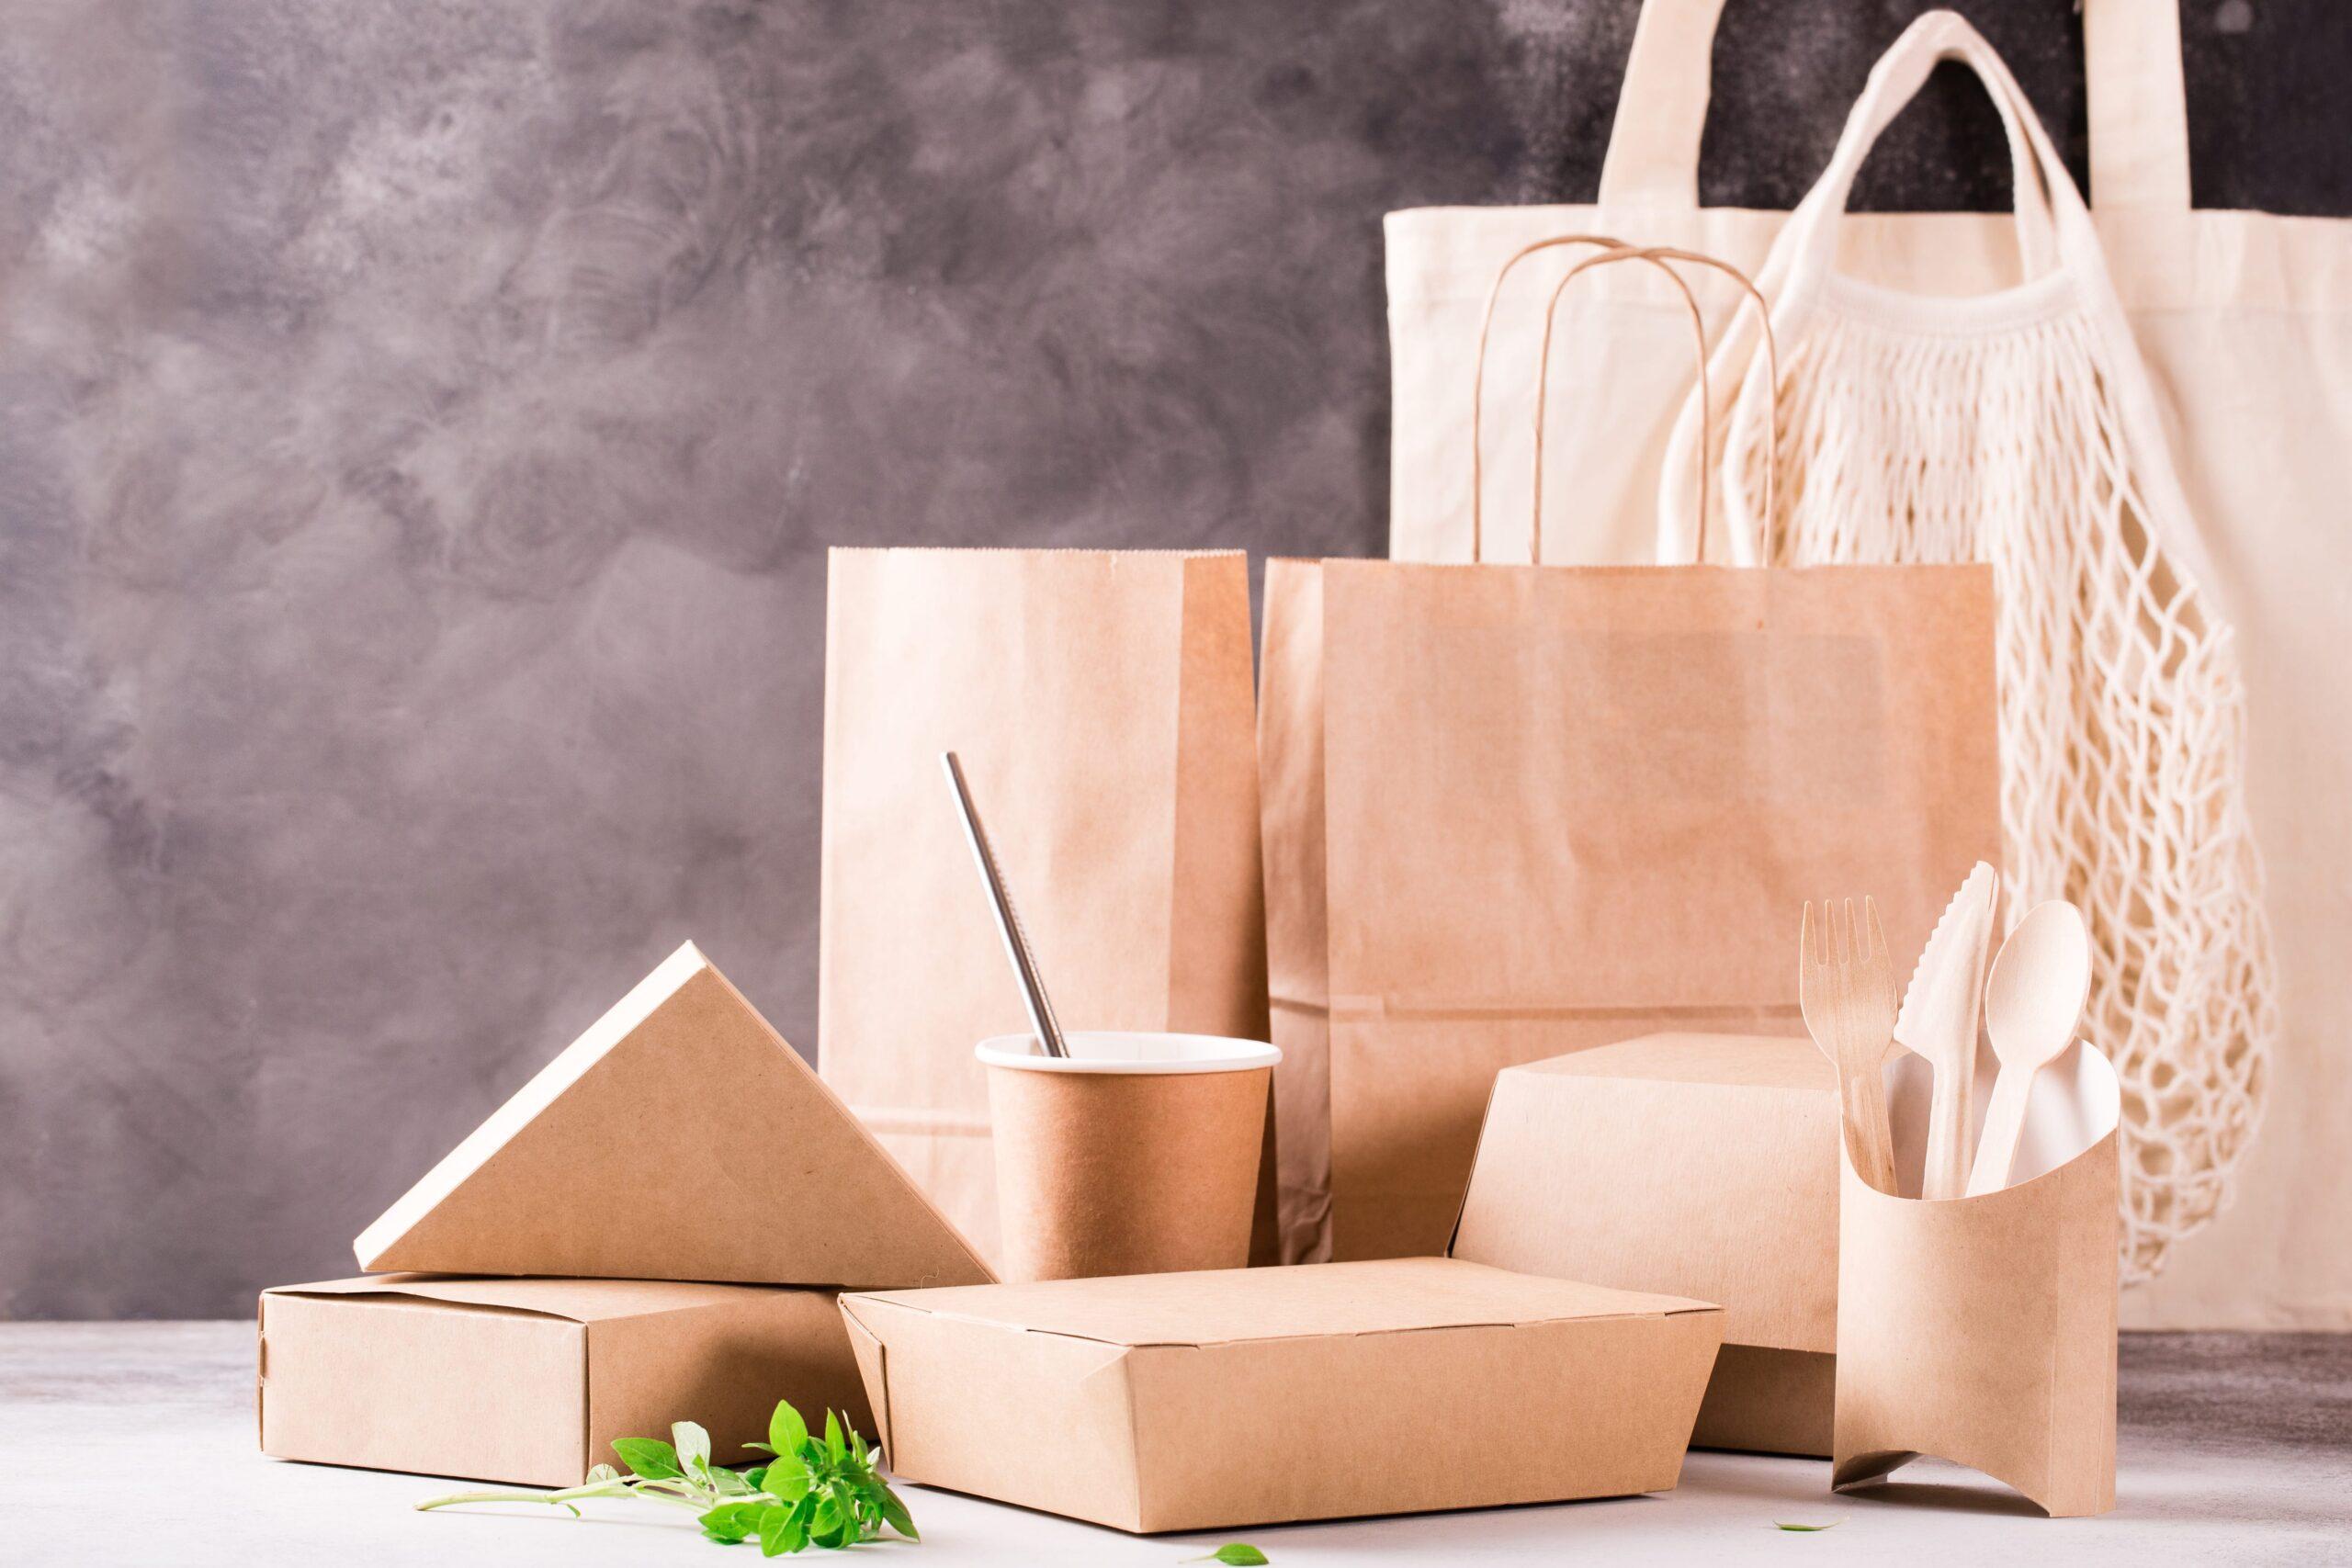 Most popular food packaging materials